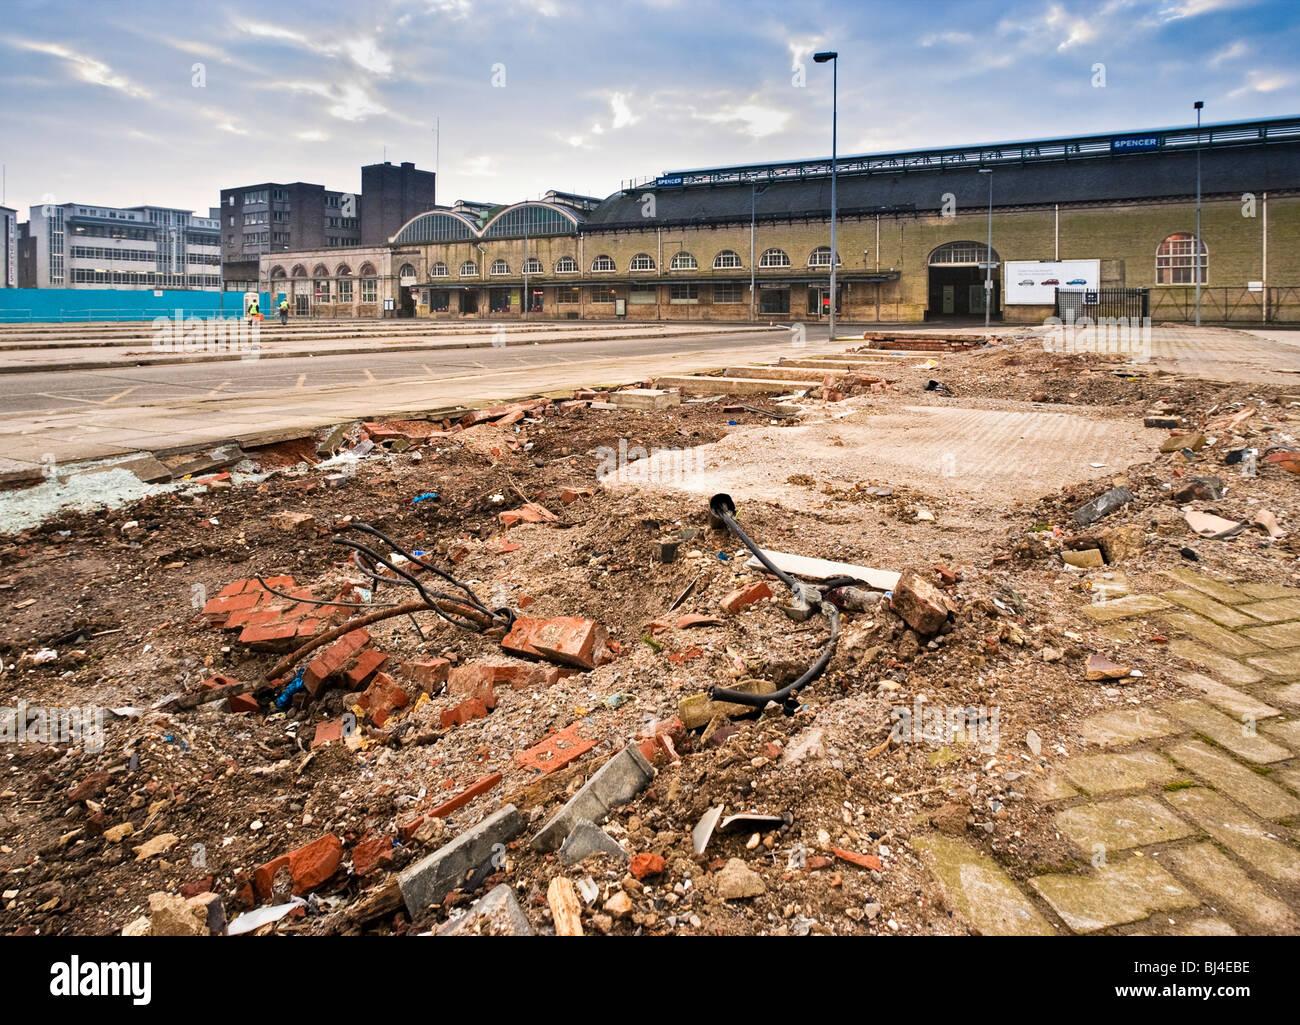 Derelict waste land building site, UK - Stock Image